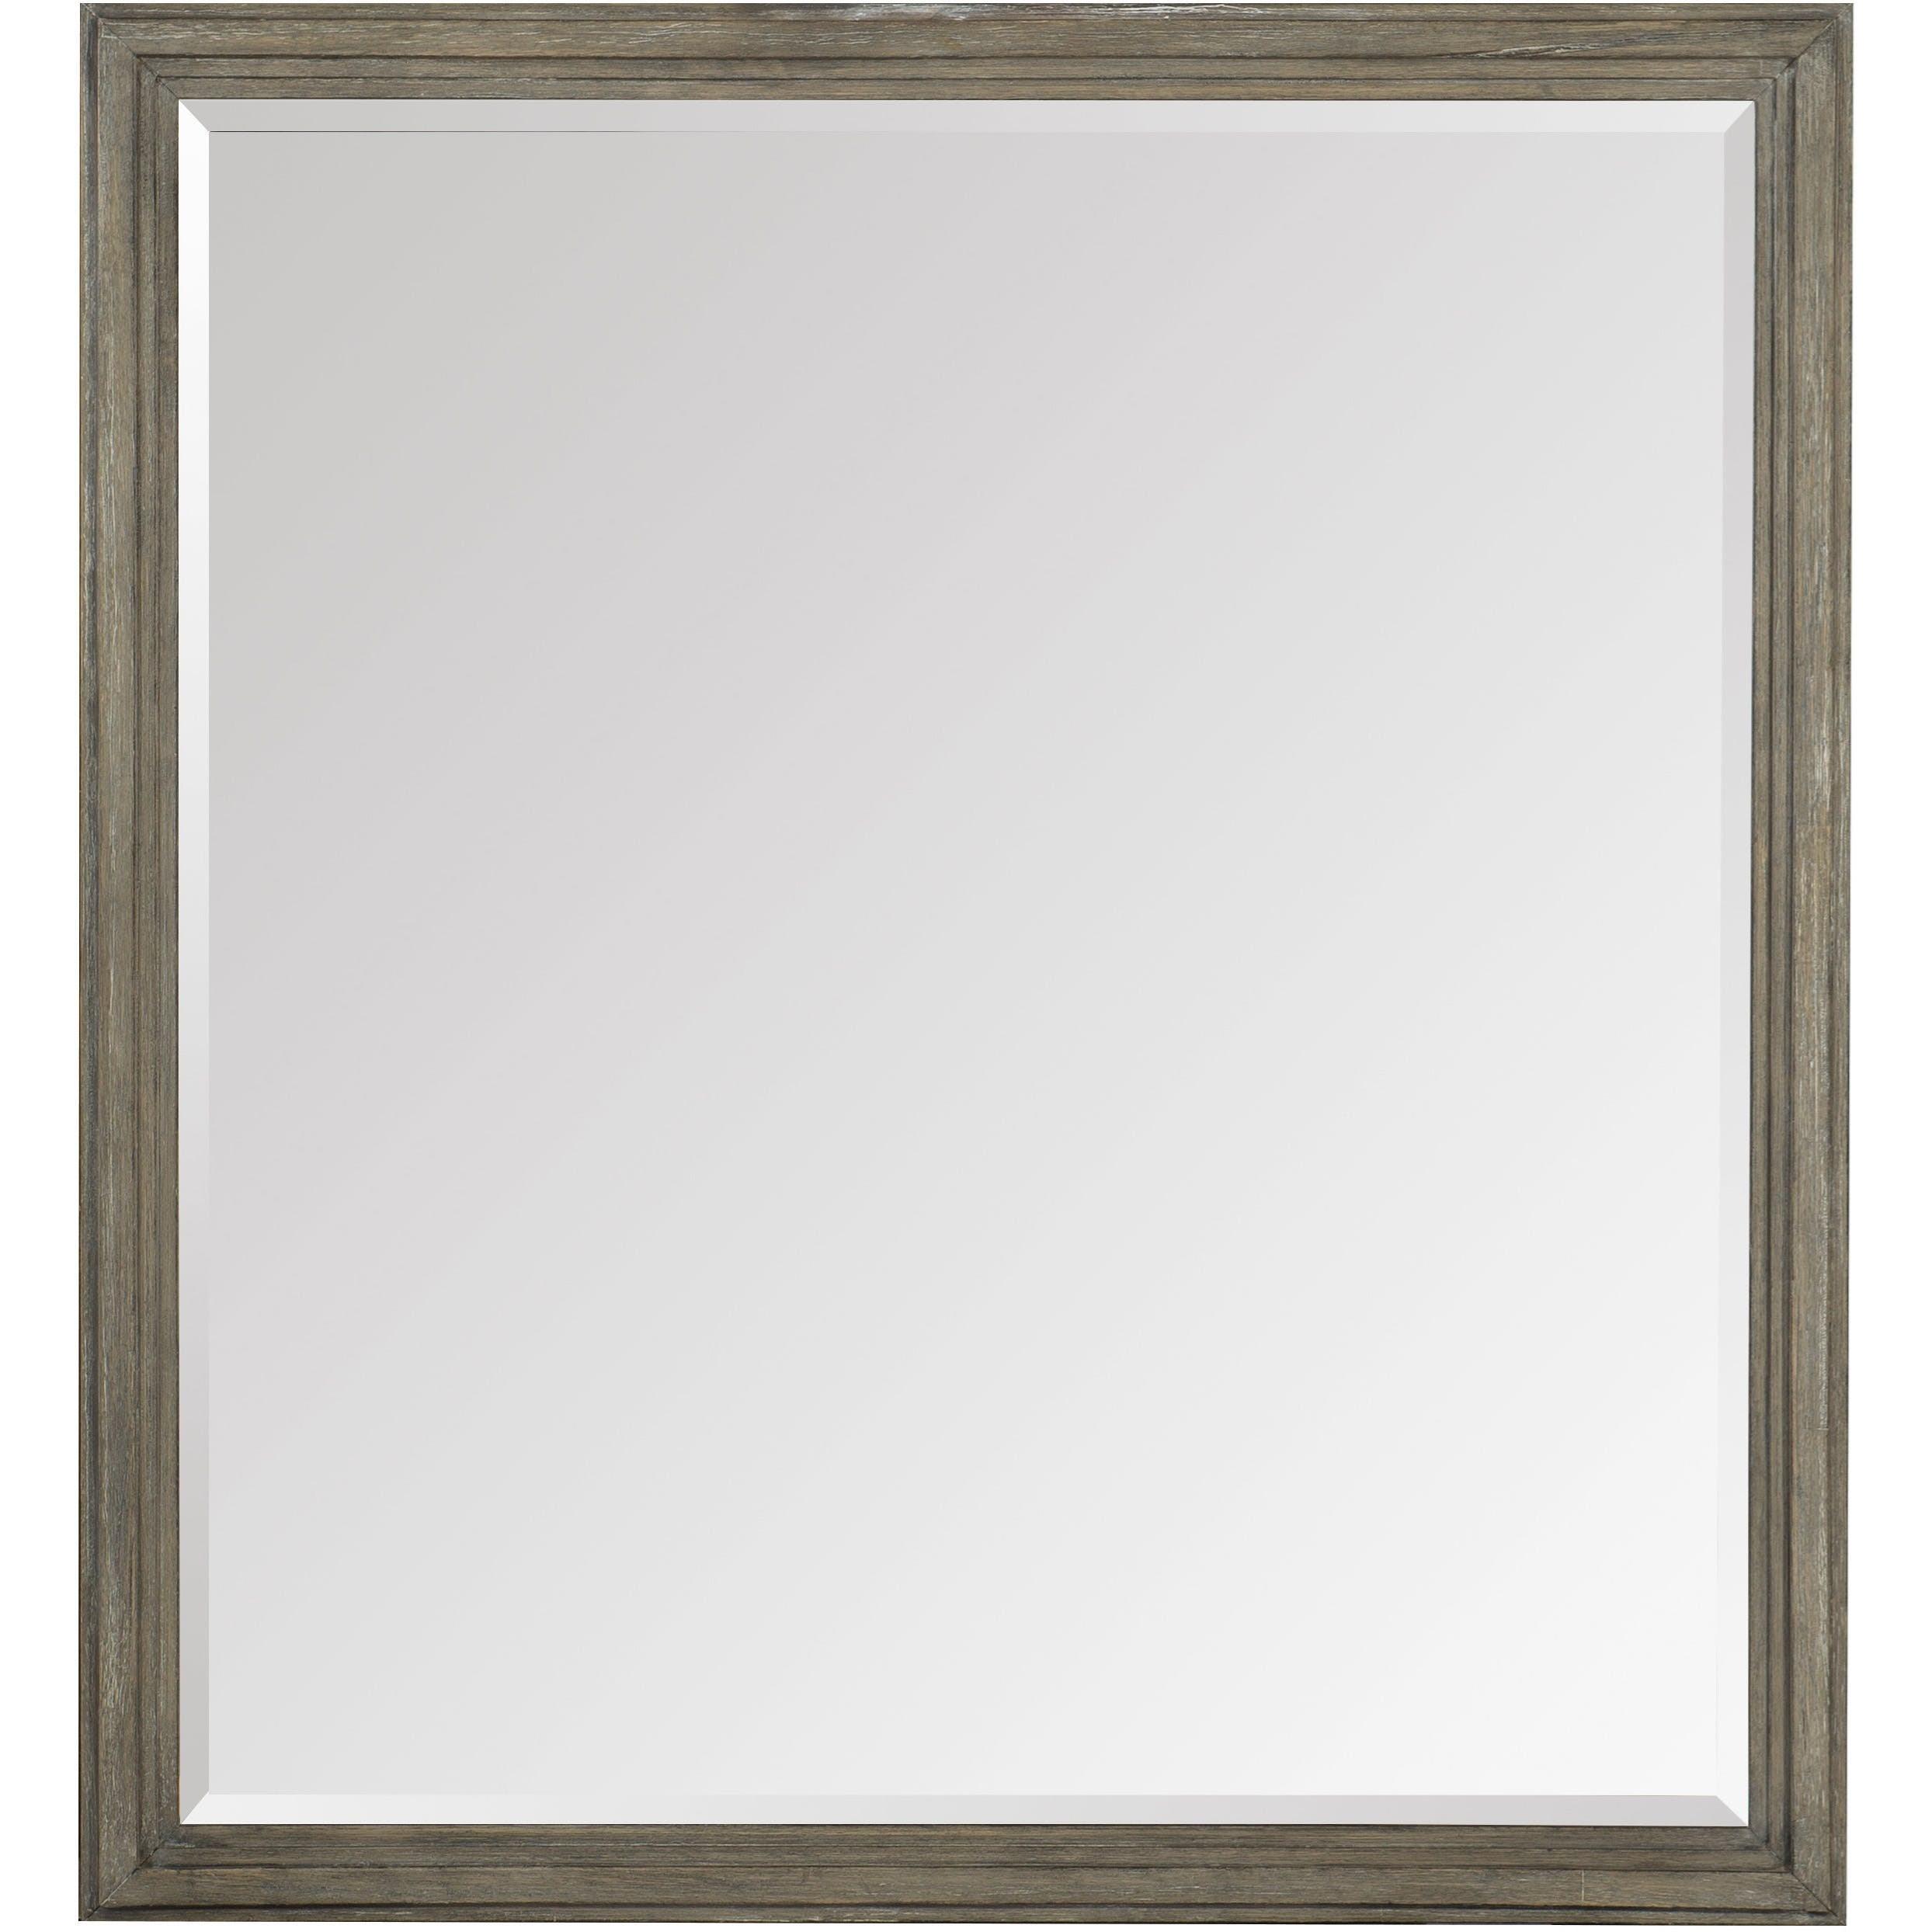 Annex Mirror by Hooker Furniture at Baer's Furniture